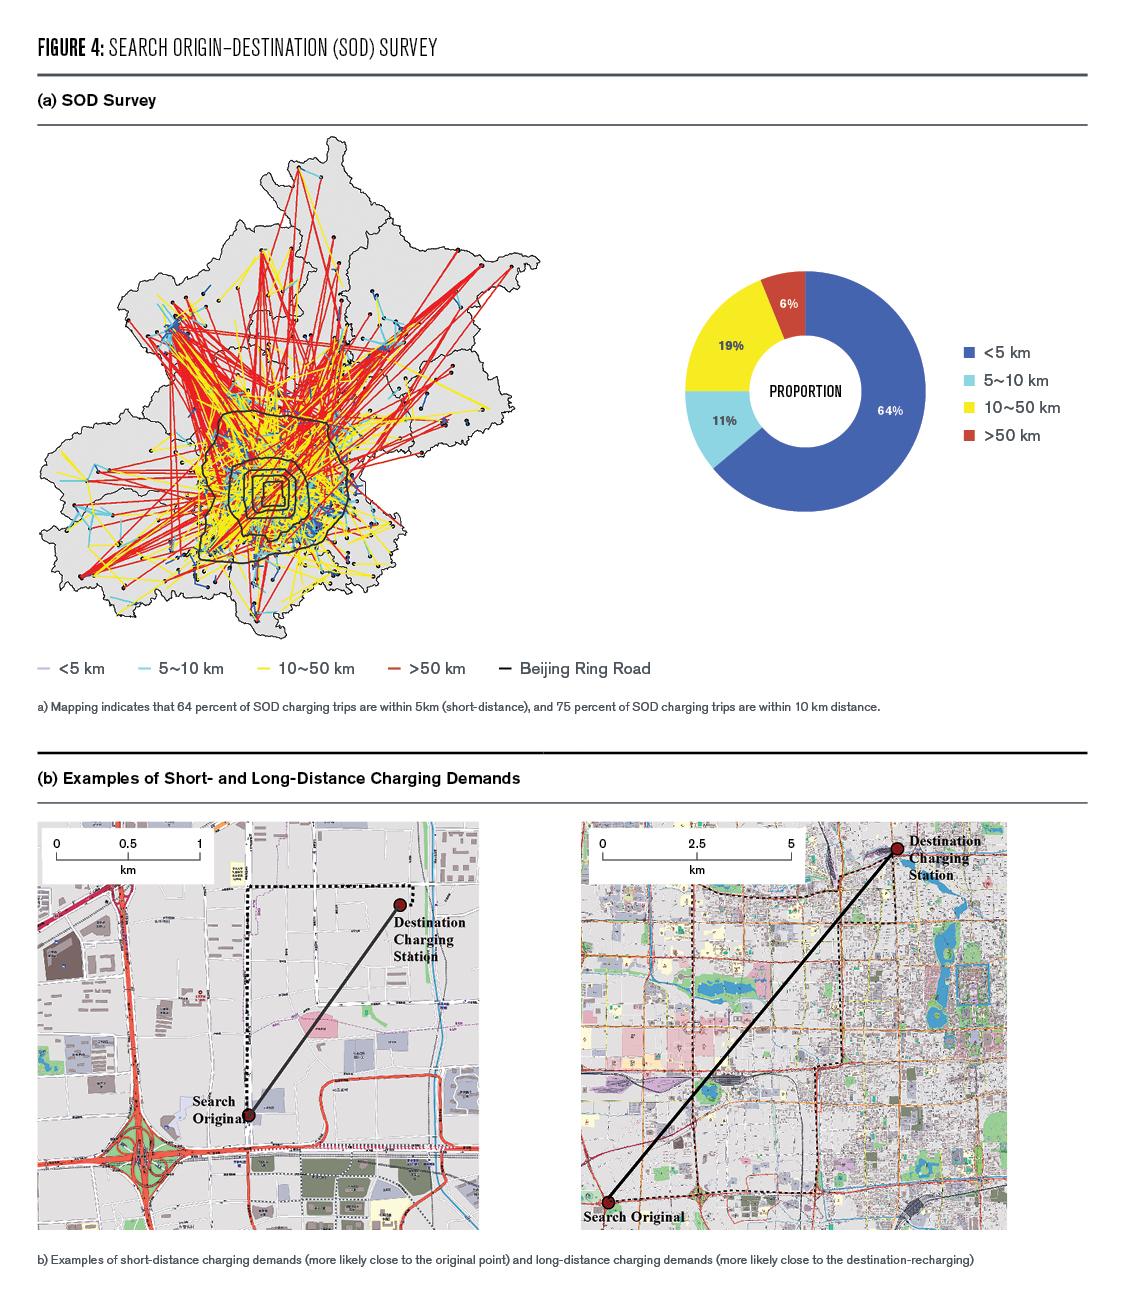 Figure 4: Search Origin-Destination (SOD) Survey